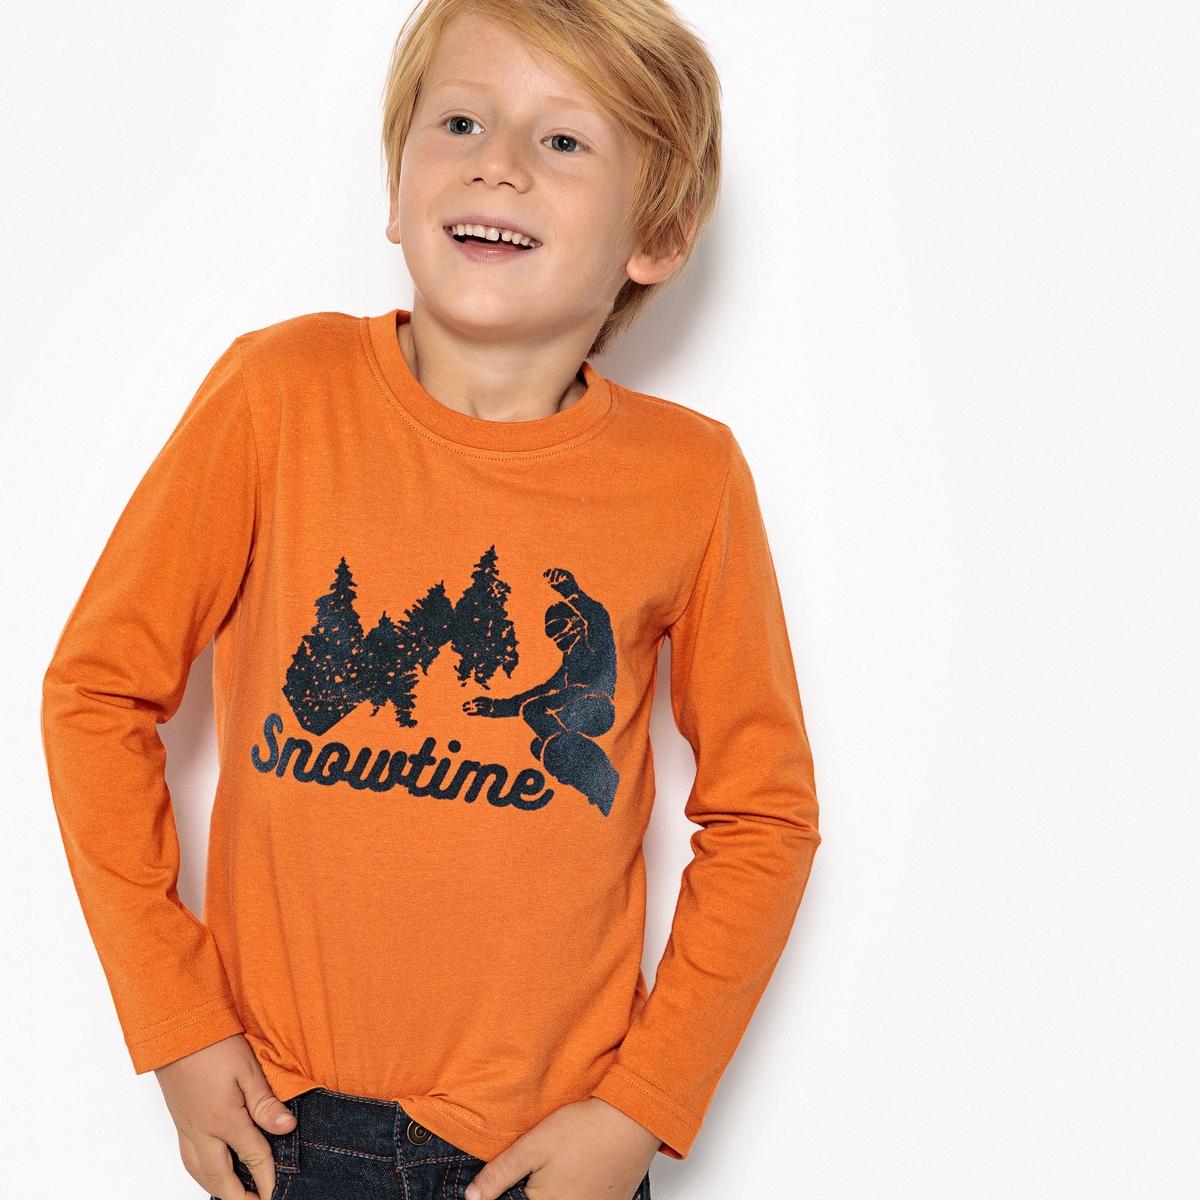 Футболка La Redoute С длинными рукавами 3 года - 94 см оранжевый colleen collins let it bree let it bree can t buy me louie